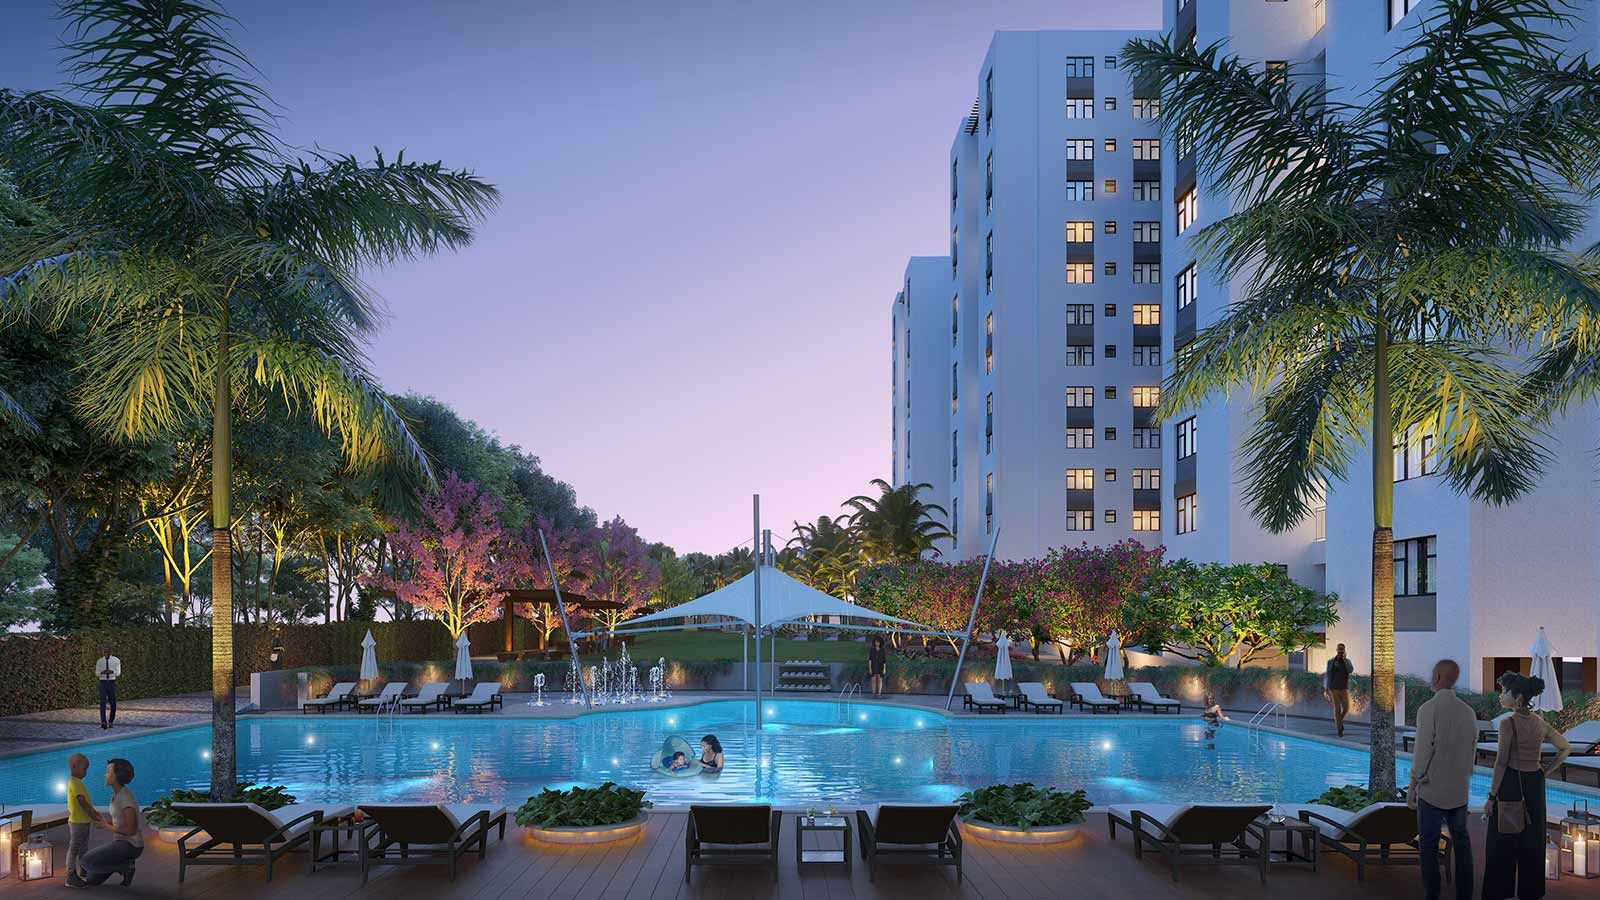 Garden City Building Pool Area - Mace Group